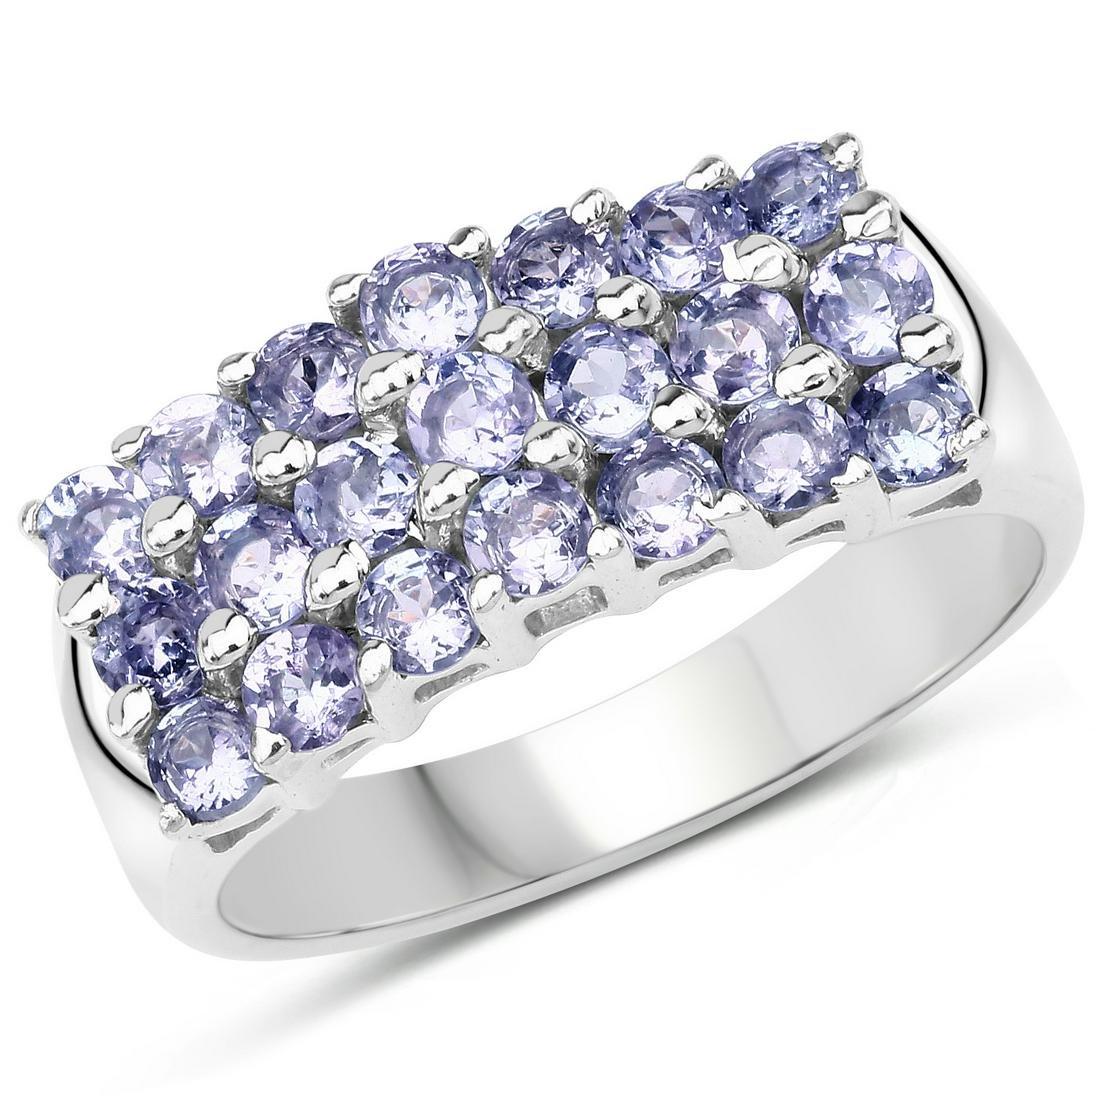 1.47 ctw Genuine Tanzanite .925 Sterling Silver Ring